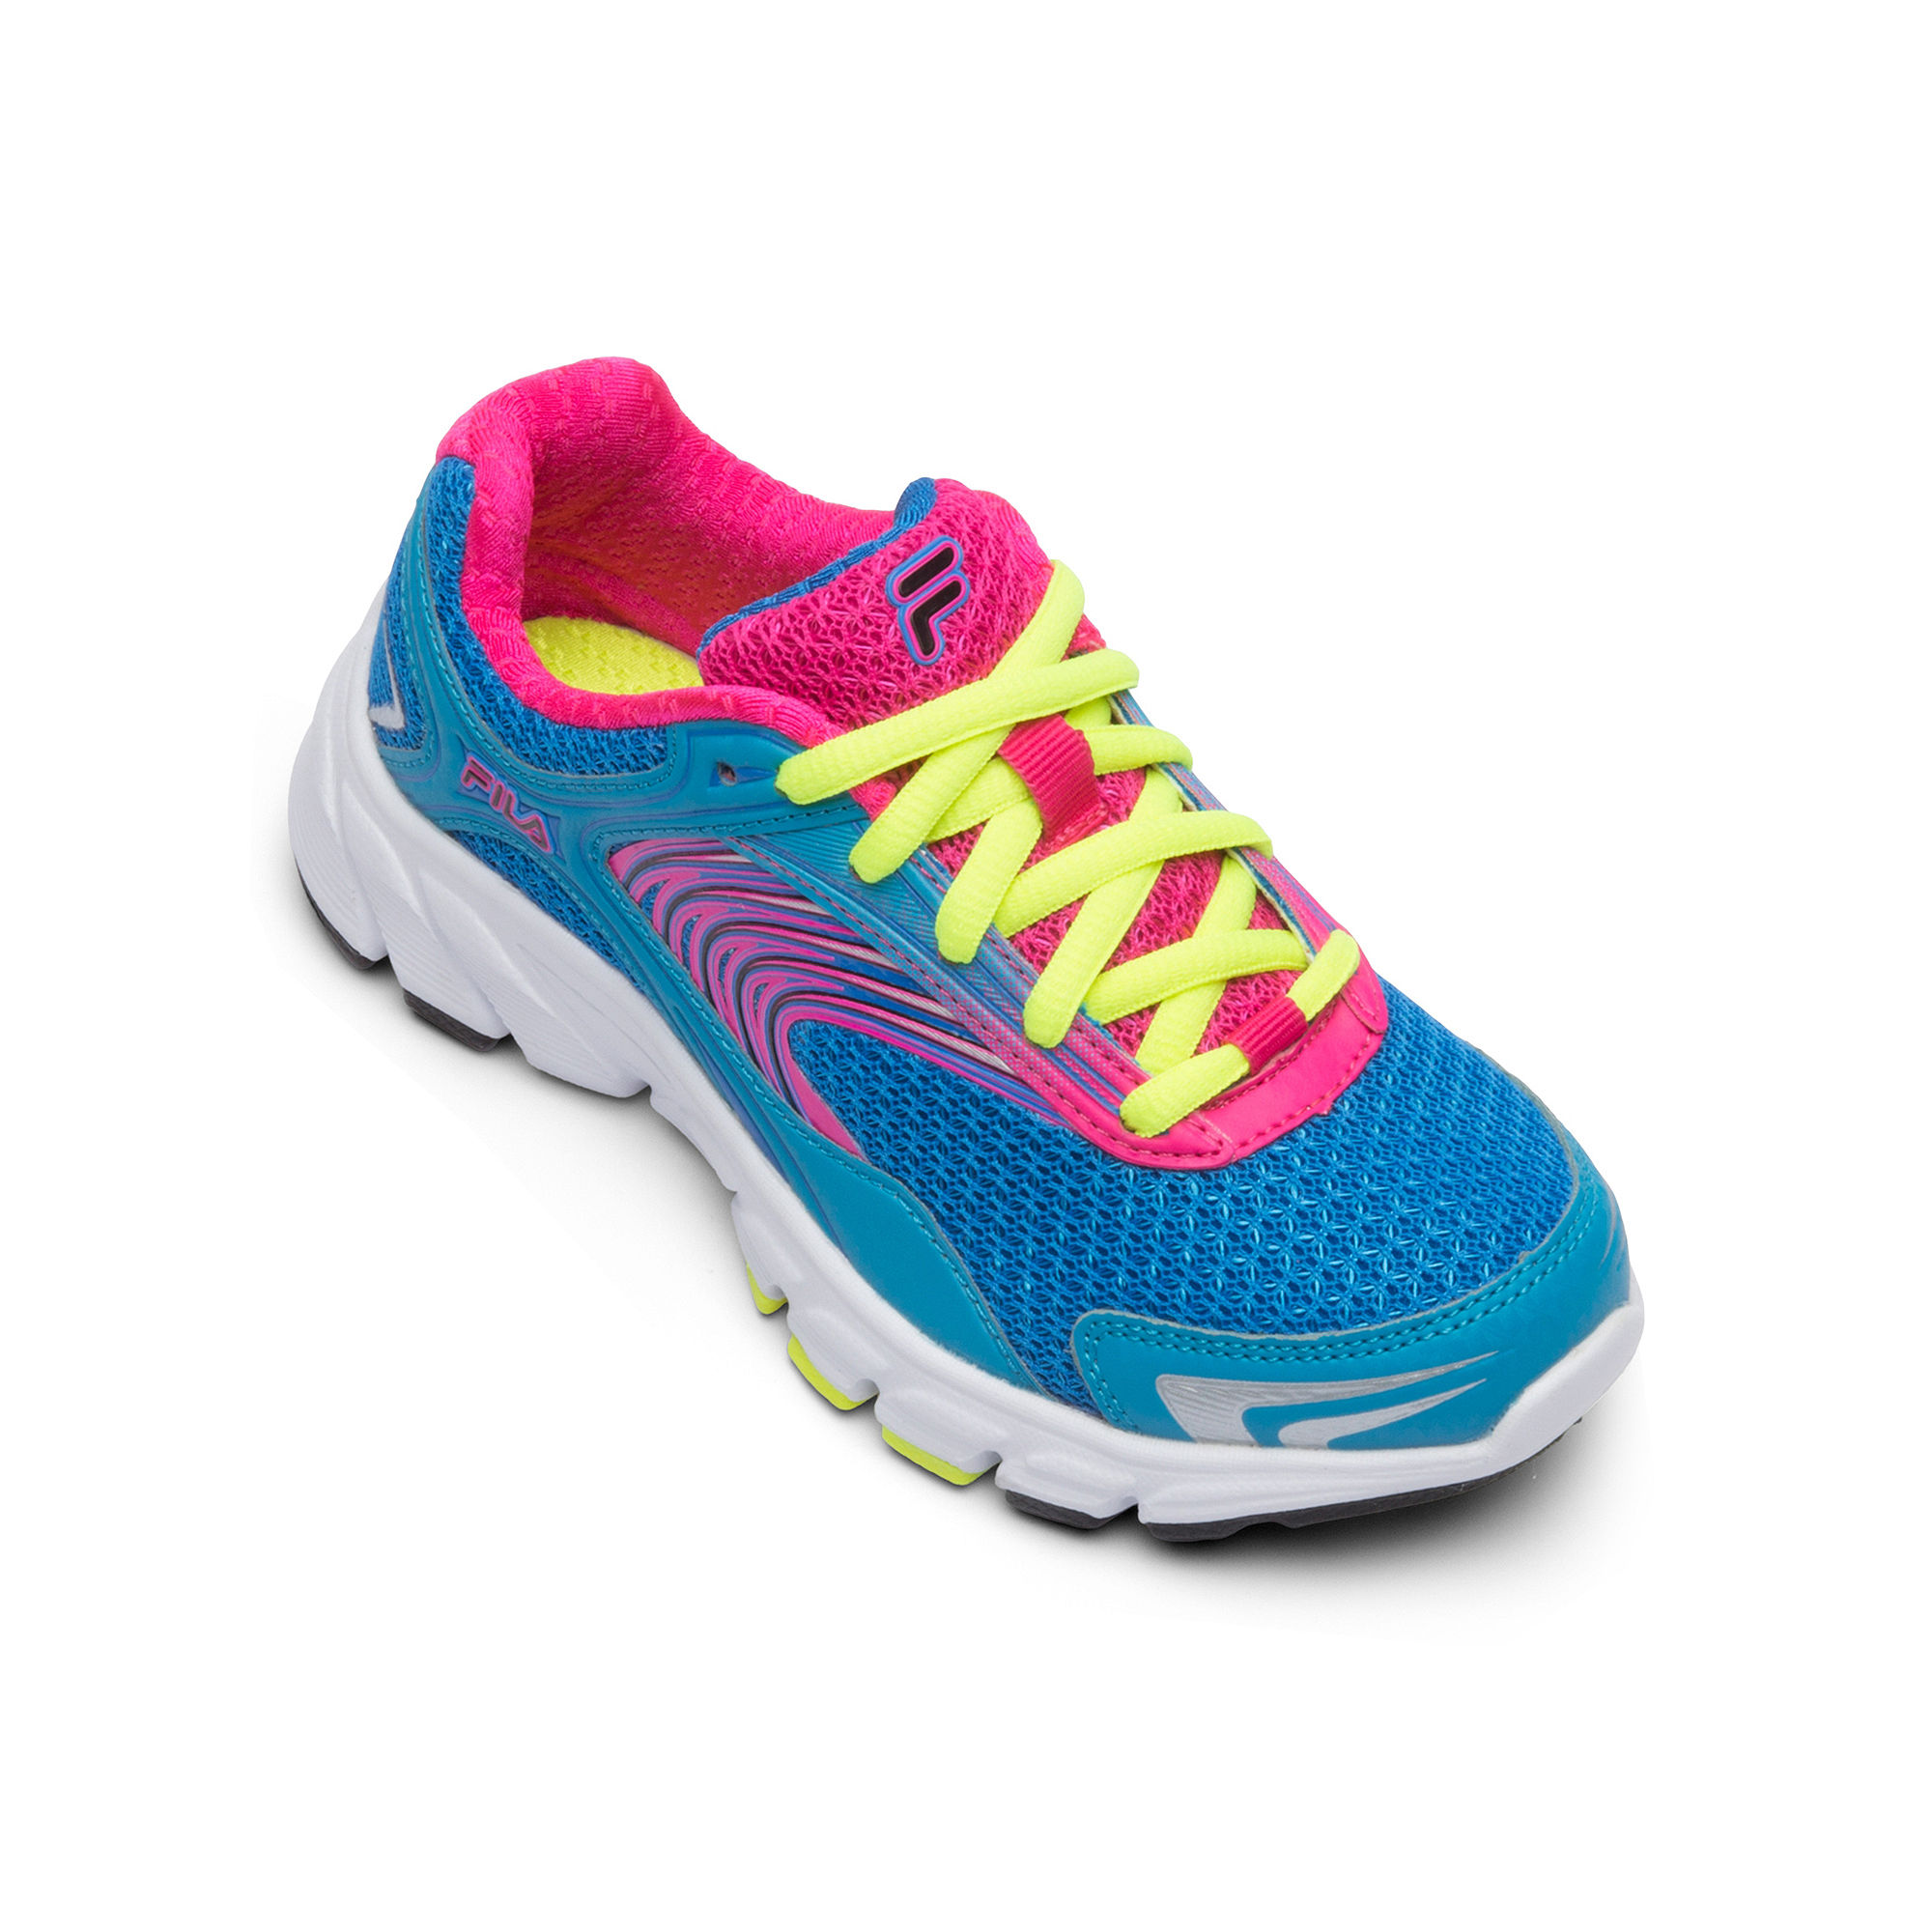 9b2b8e0ee70a UPC 789482408589 product image for Fila Maranello 3 Girls Running Shoes - Little  Kids Big ...